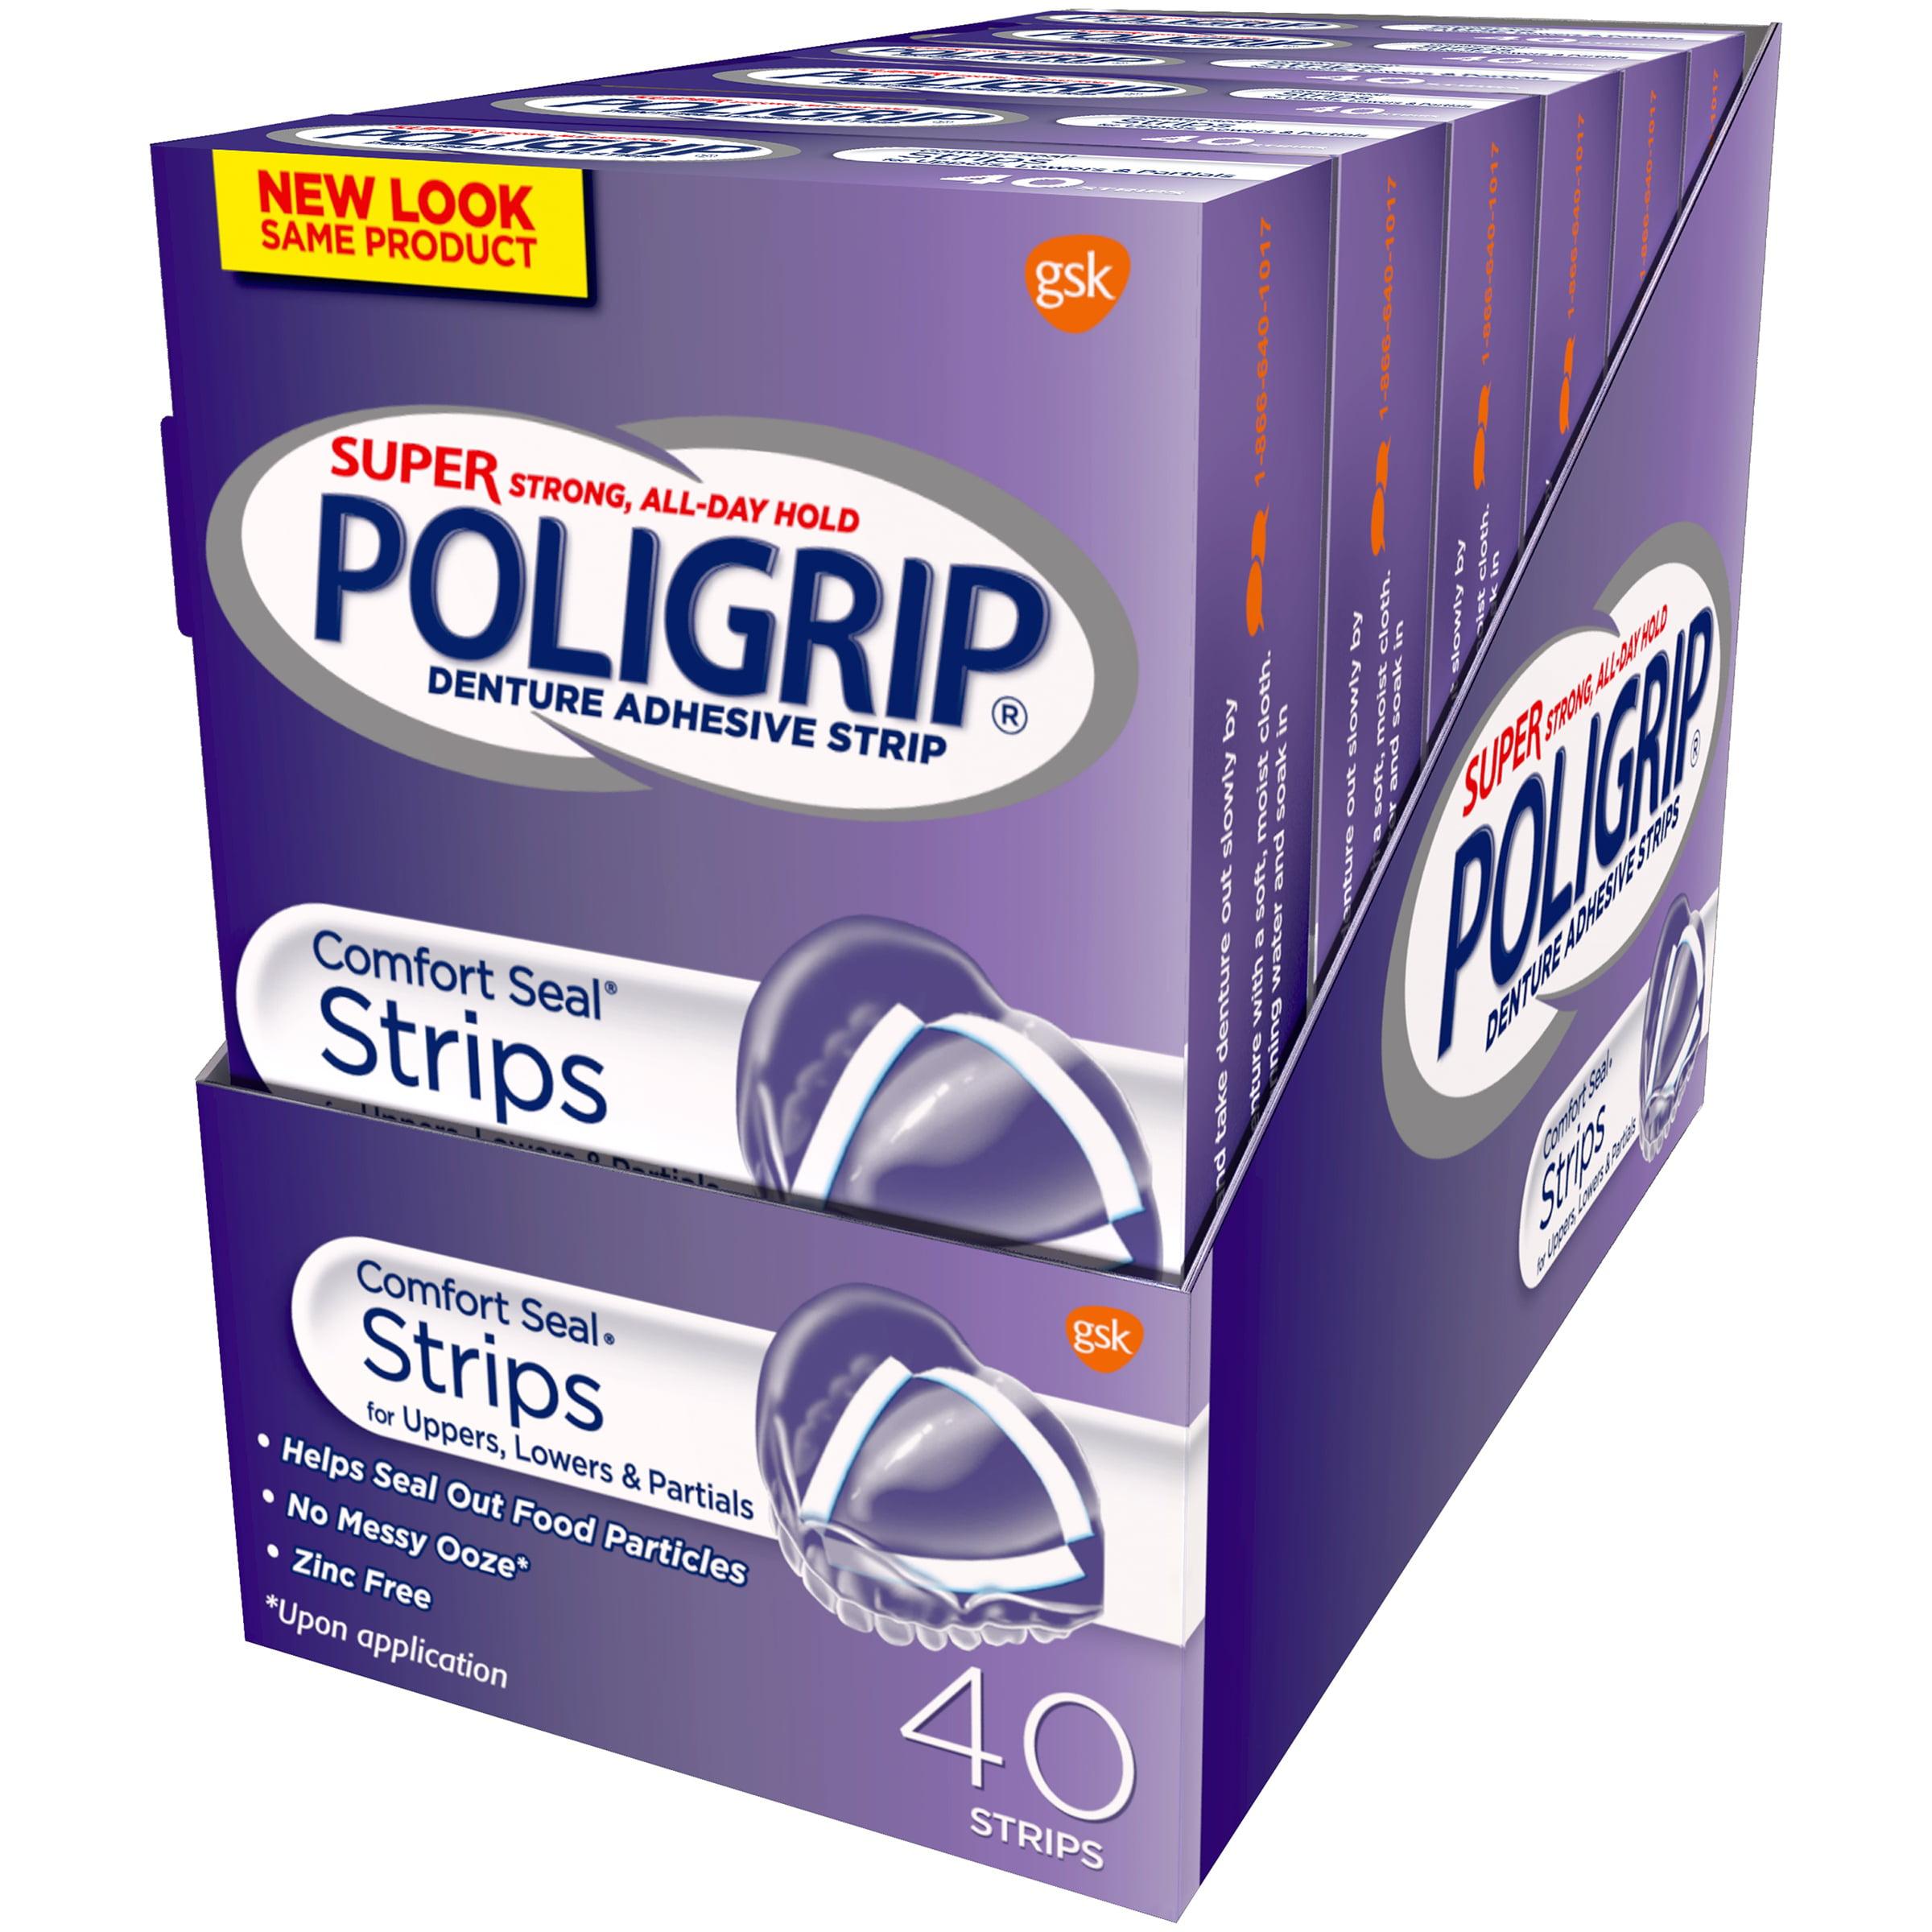 Cushion grip denture adhesive walmart - Super Poligrip Comfort Seal Denture Adhesive Strips 40 Count Boxes Walmart Com